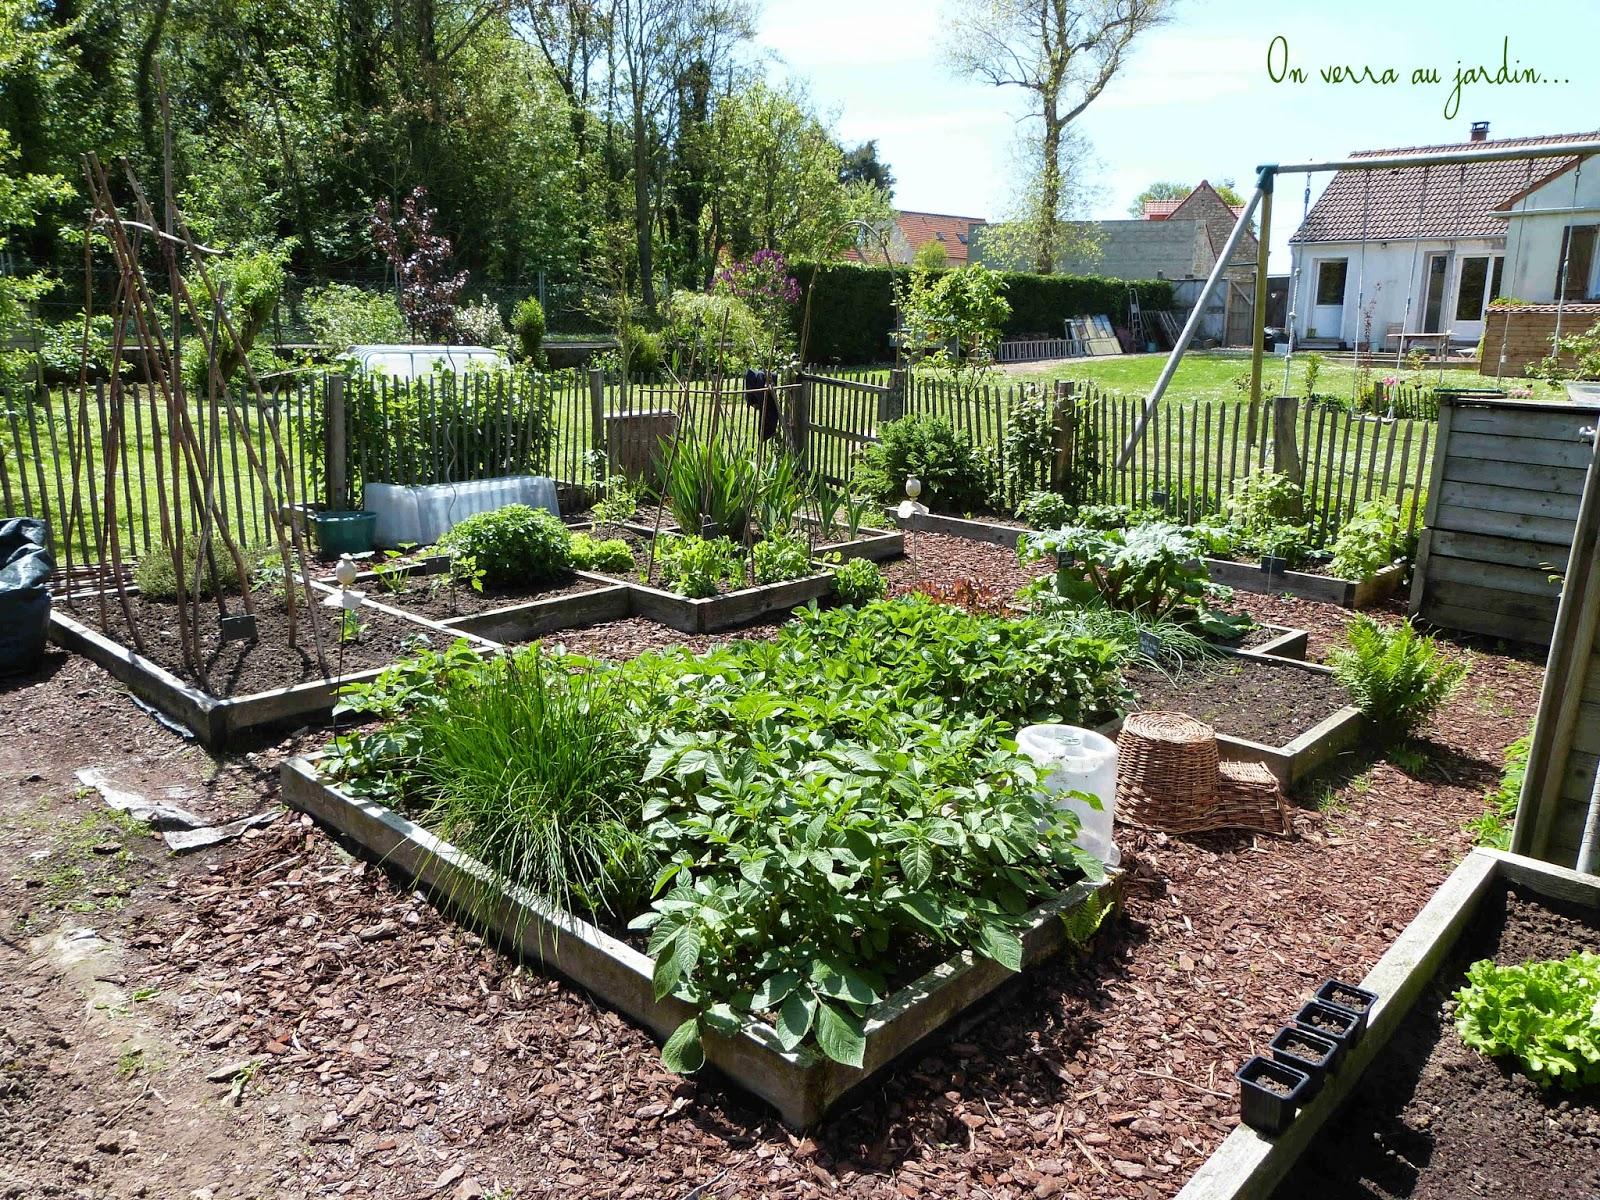 On verra au jardin au fond du potager for Au jardin potager